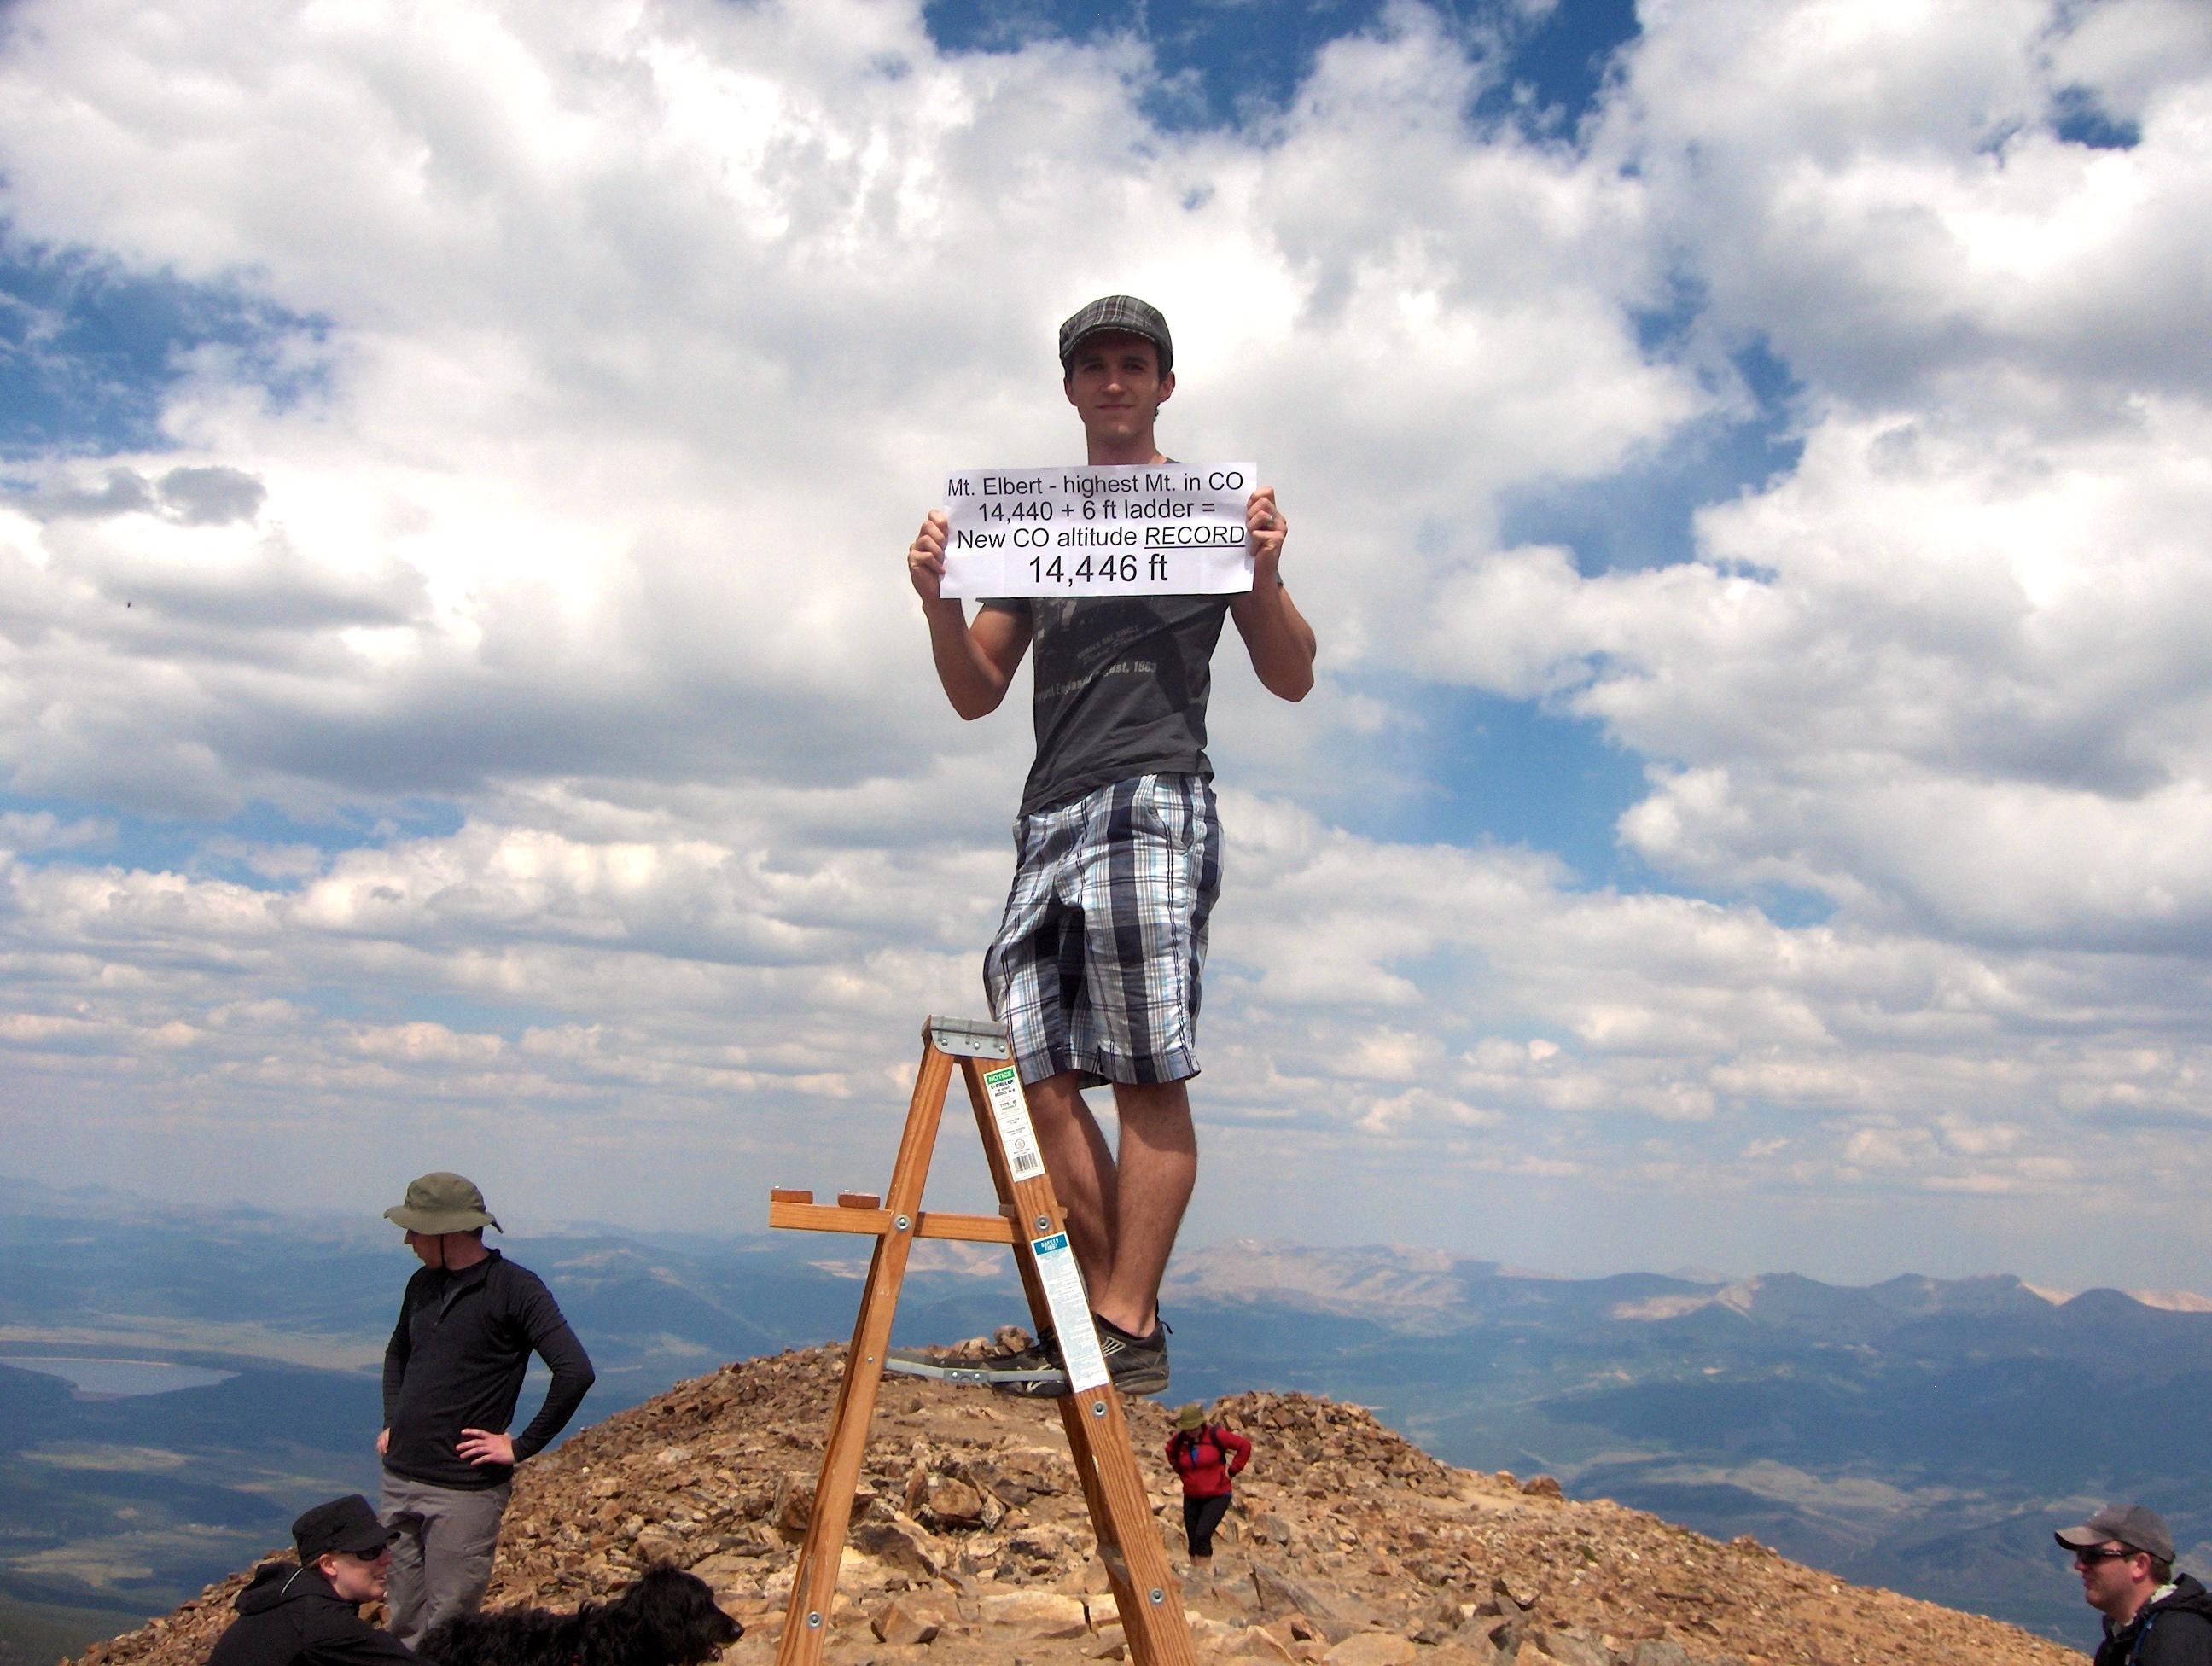 Colorado Altitude Record : Photos, Diagrams & Topos : SummitPost